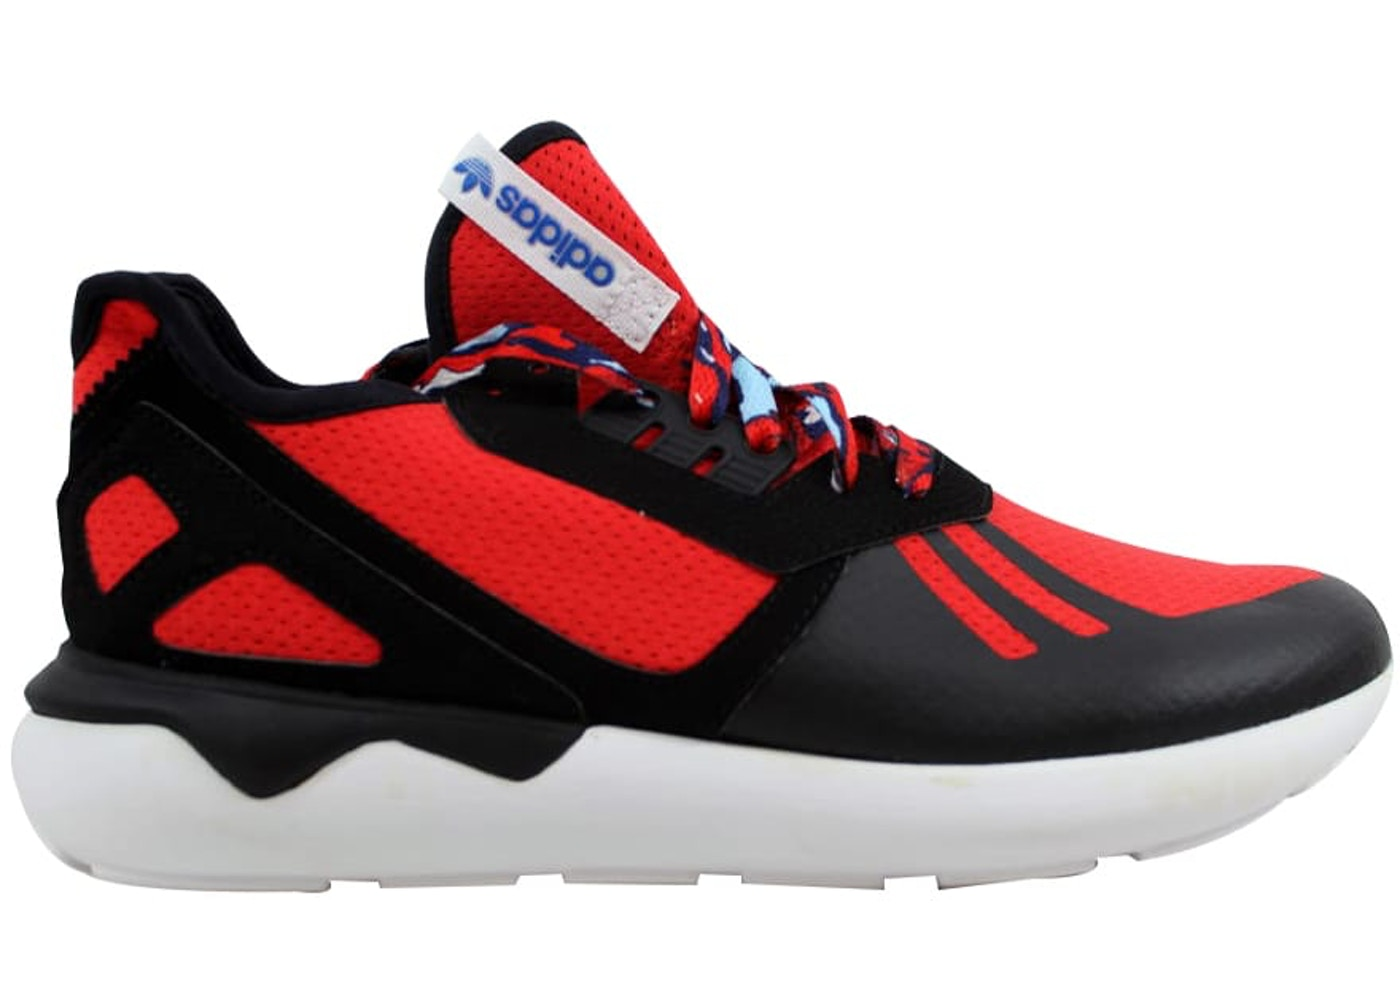 newest c807d 3c603 adidas Tubular Runner Red/Black/White